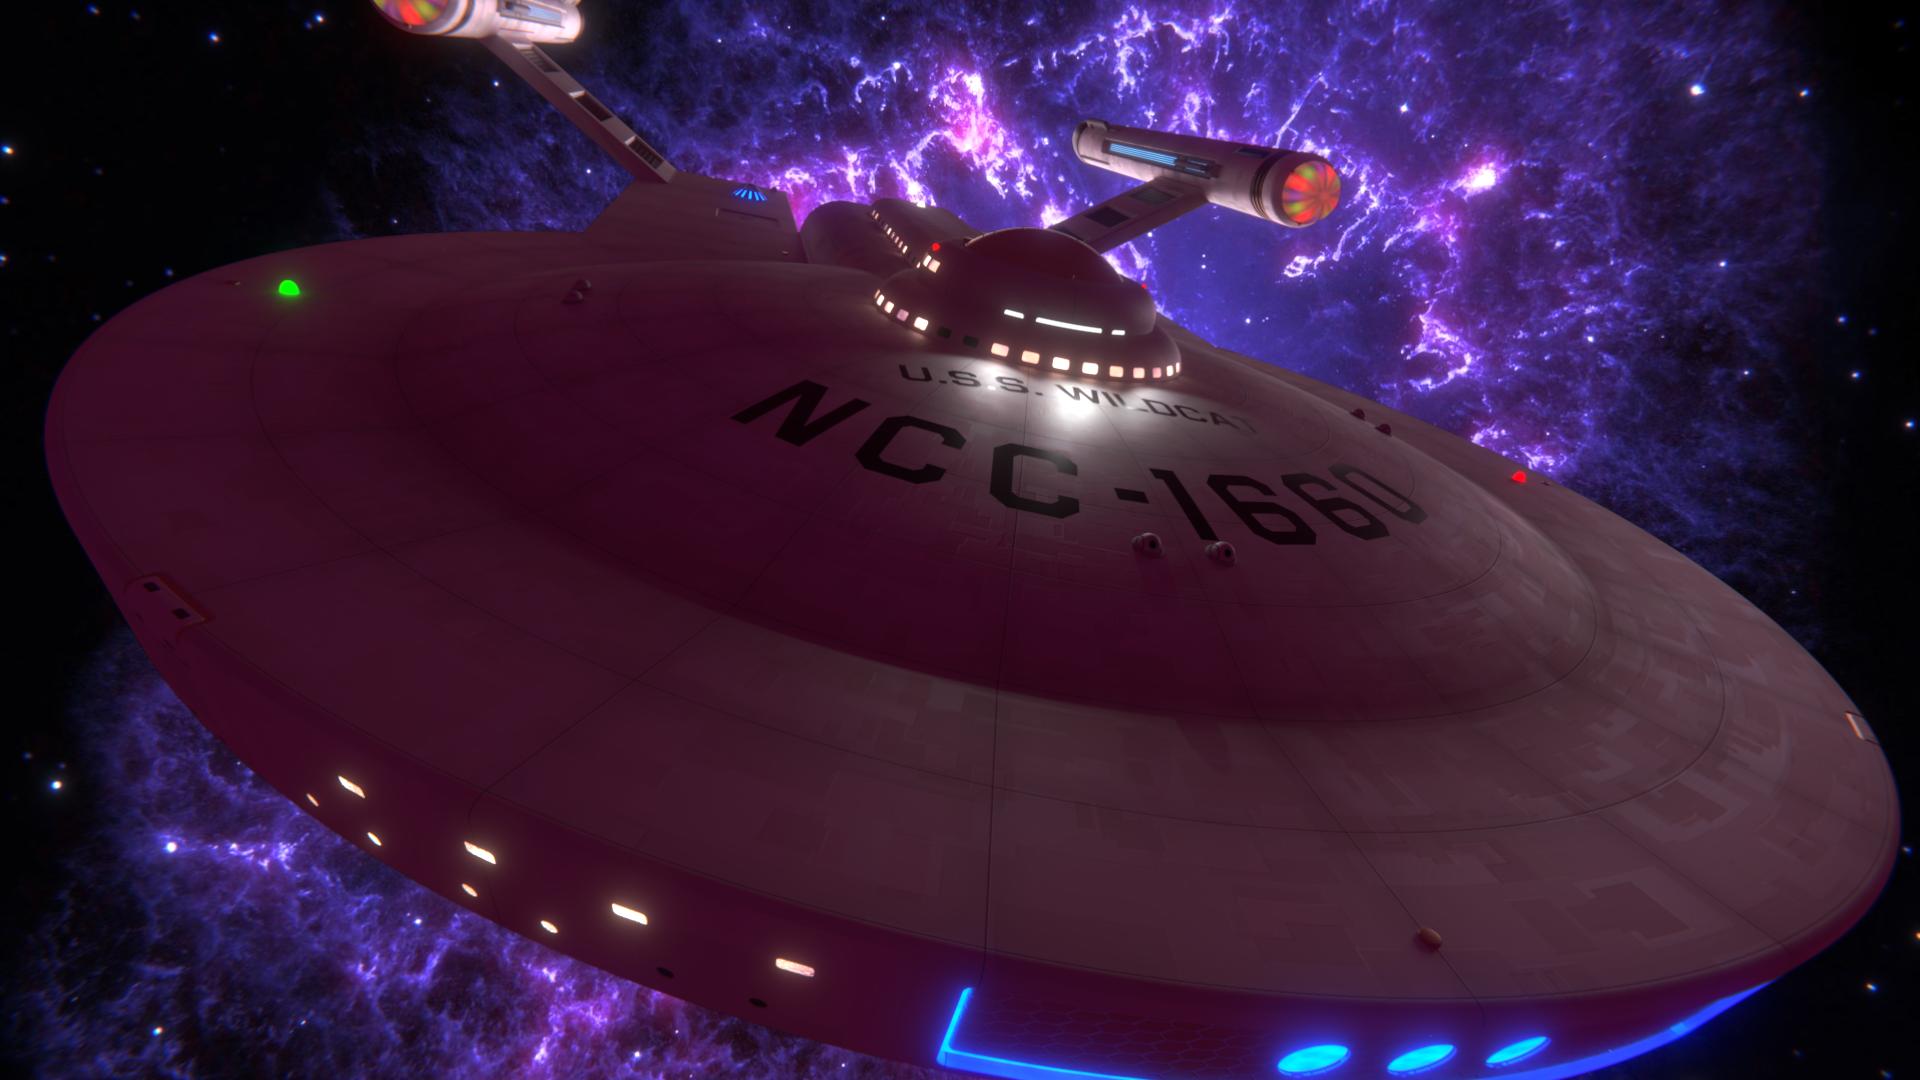 nebula_survey_by_rekkert-dc75utf.png